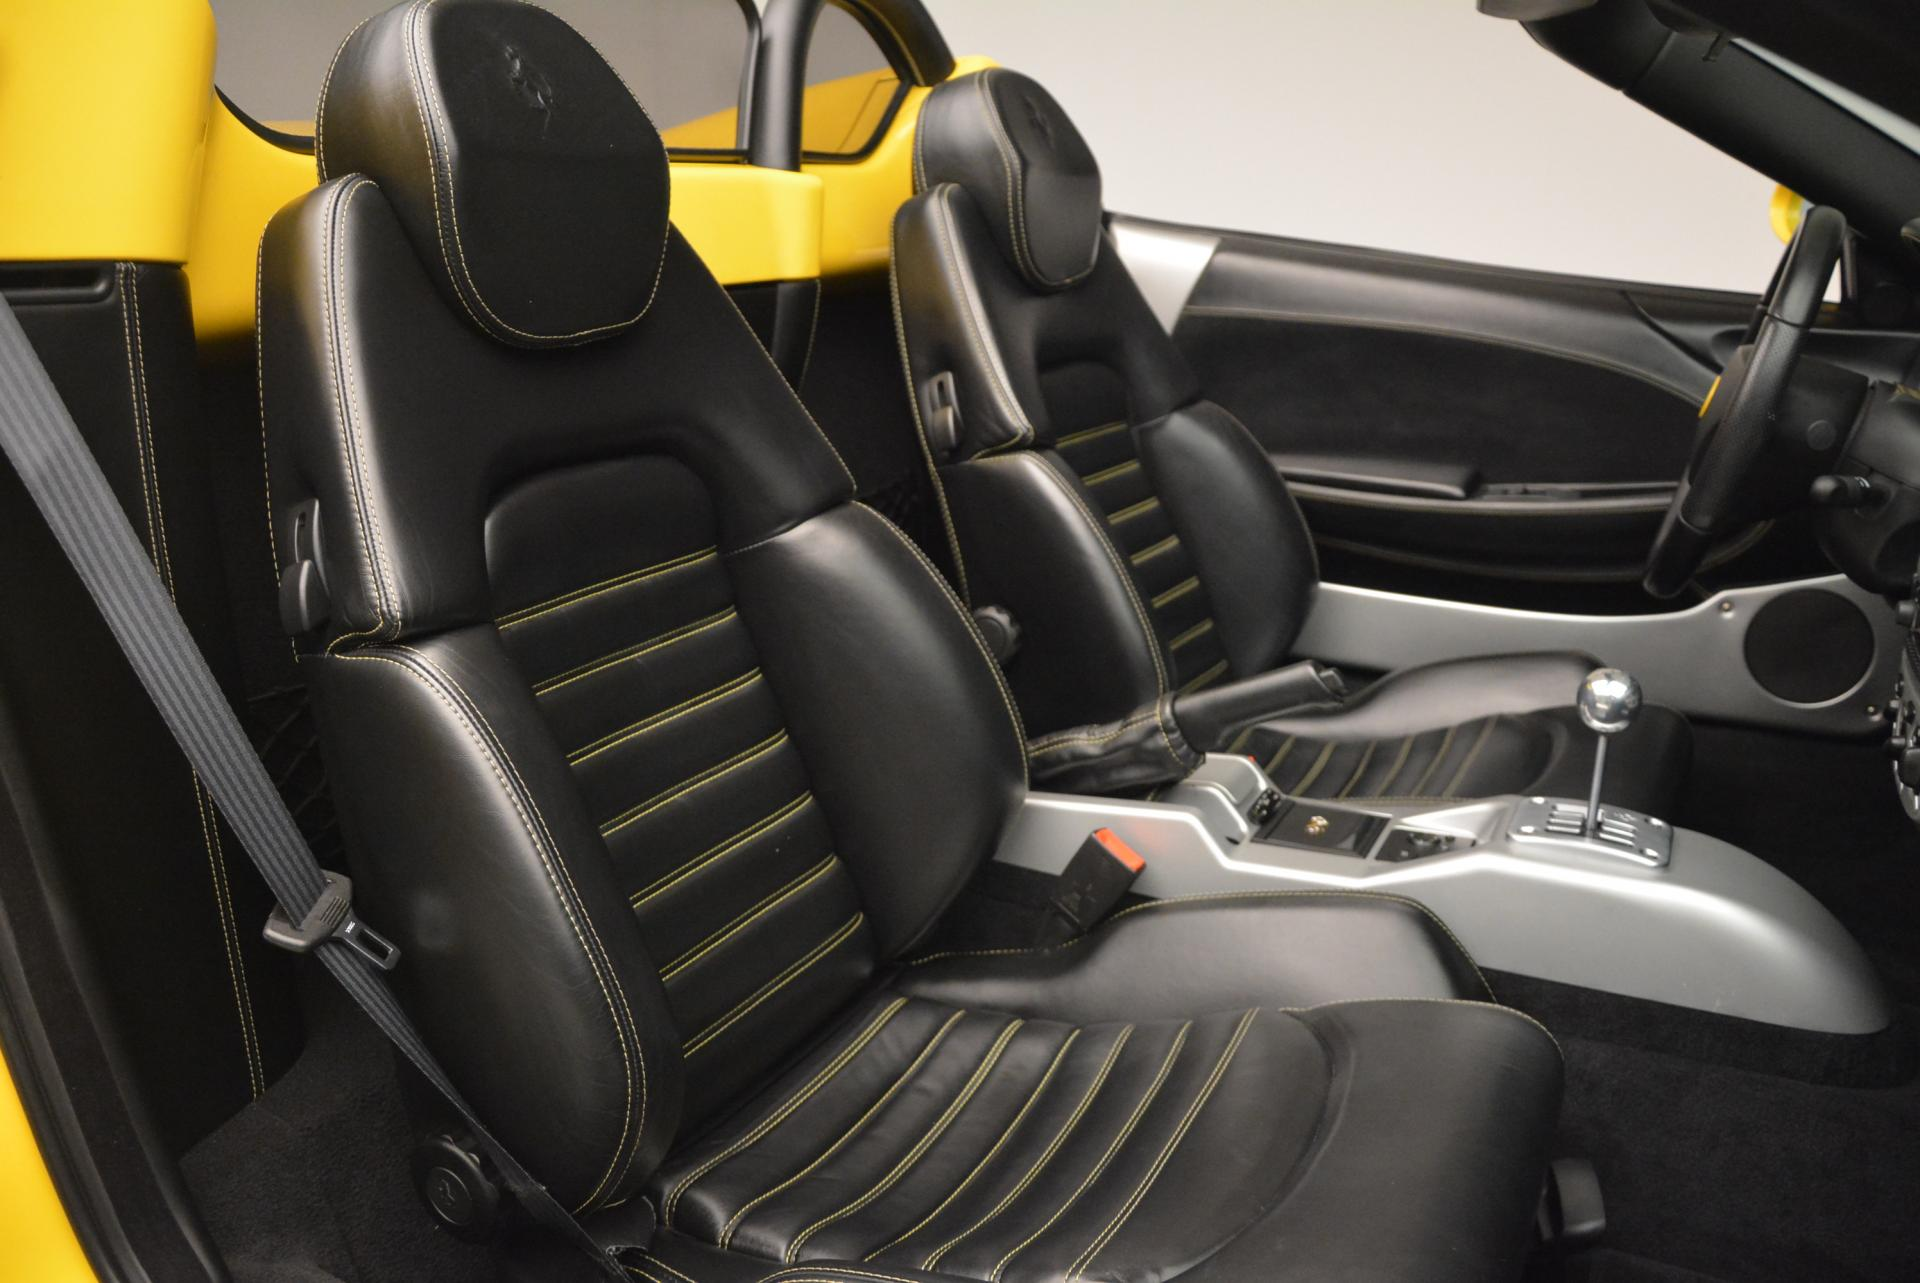 Used 2003 Ferrari 360 Spider 6-Speed Manual  For Sale In Greenwich, CT. Alfa Romeo of Greenwich, 4239A 127_p31